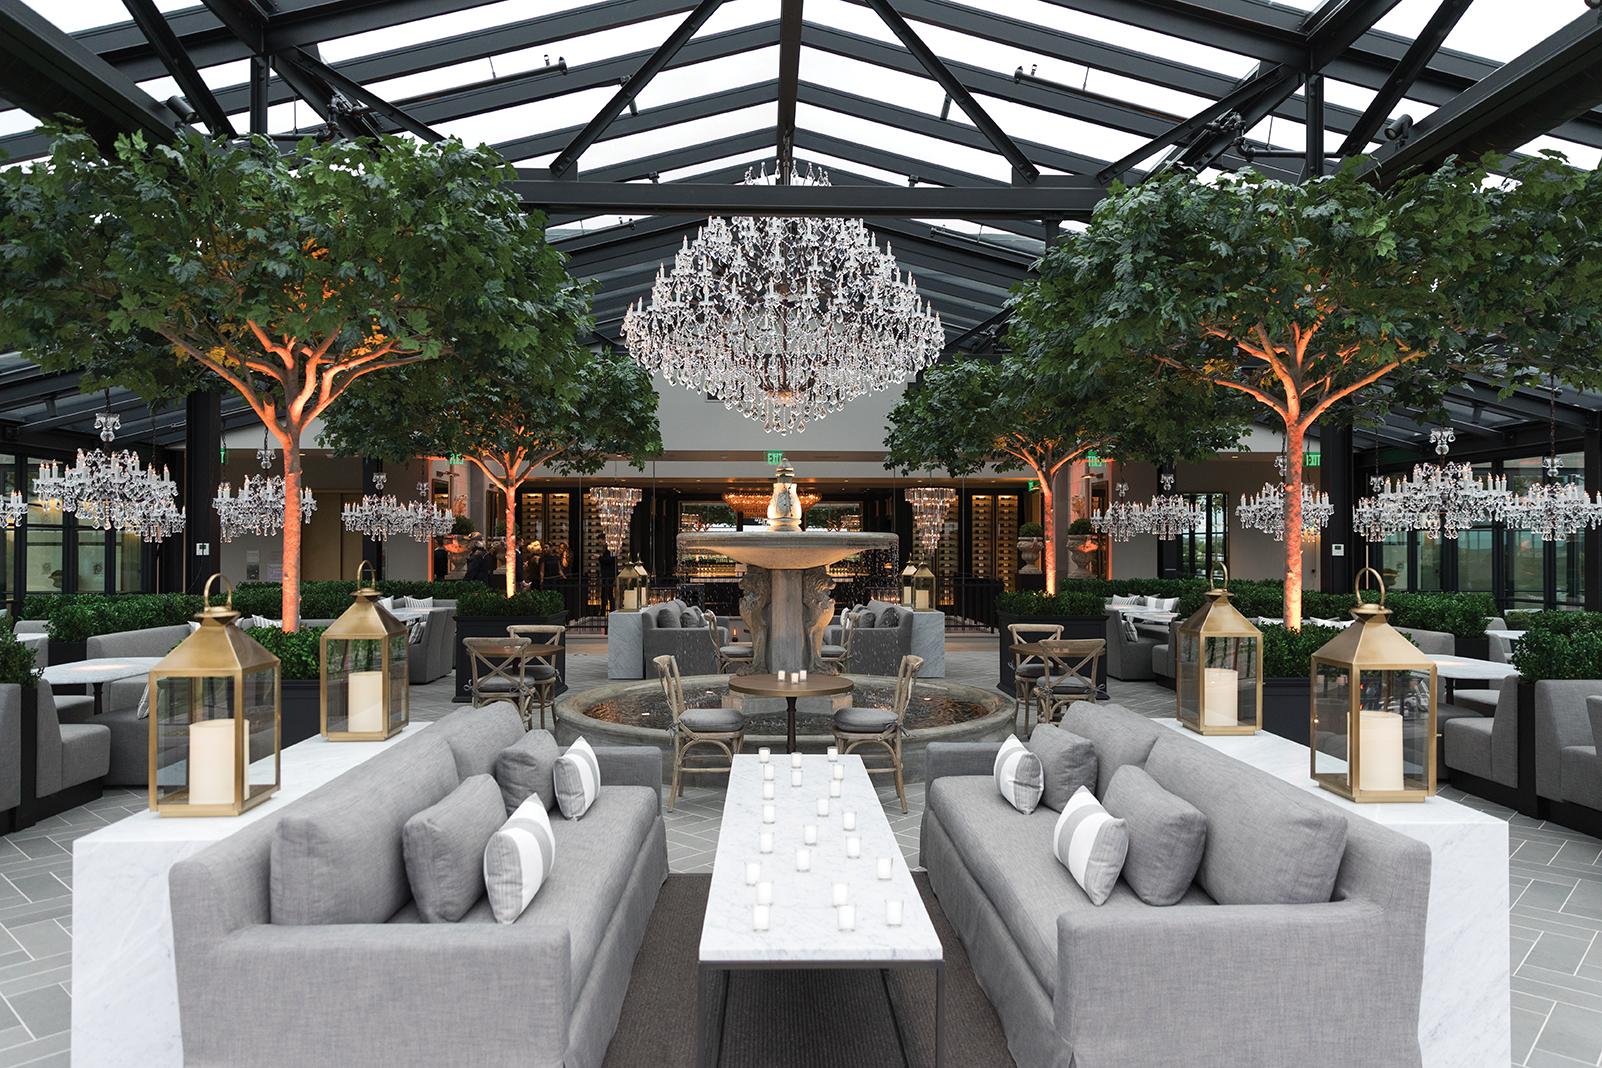 The inside of RH Rooftop Restaurant